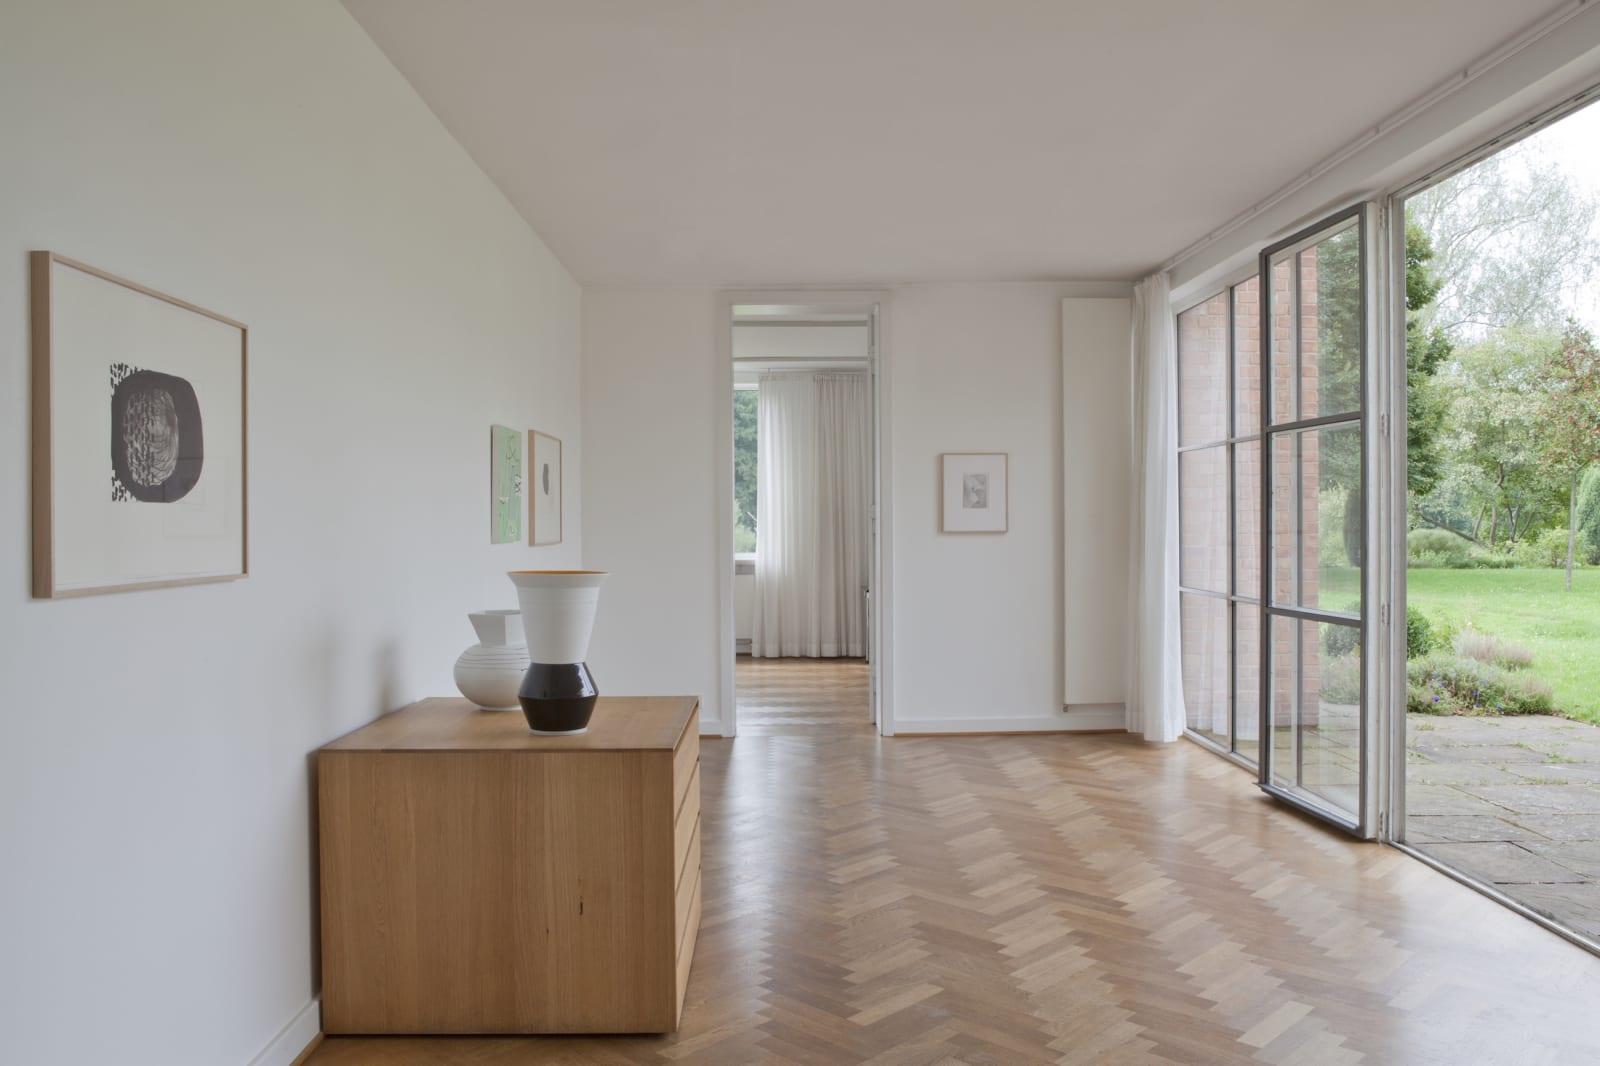 Installation view, Lemke, Mies van der Rohe Haus, Berlin (2011) | Photo: Benedikt Partenheimer